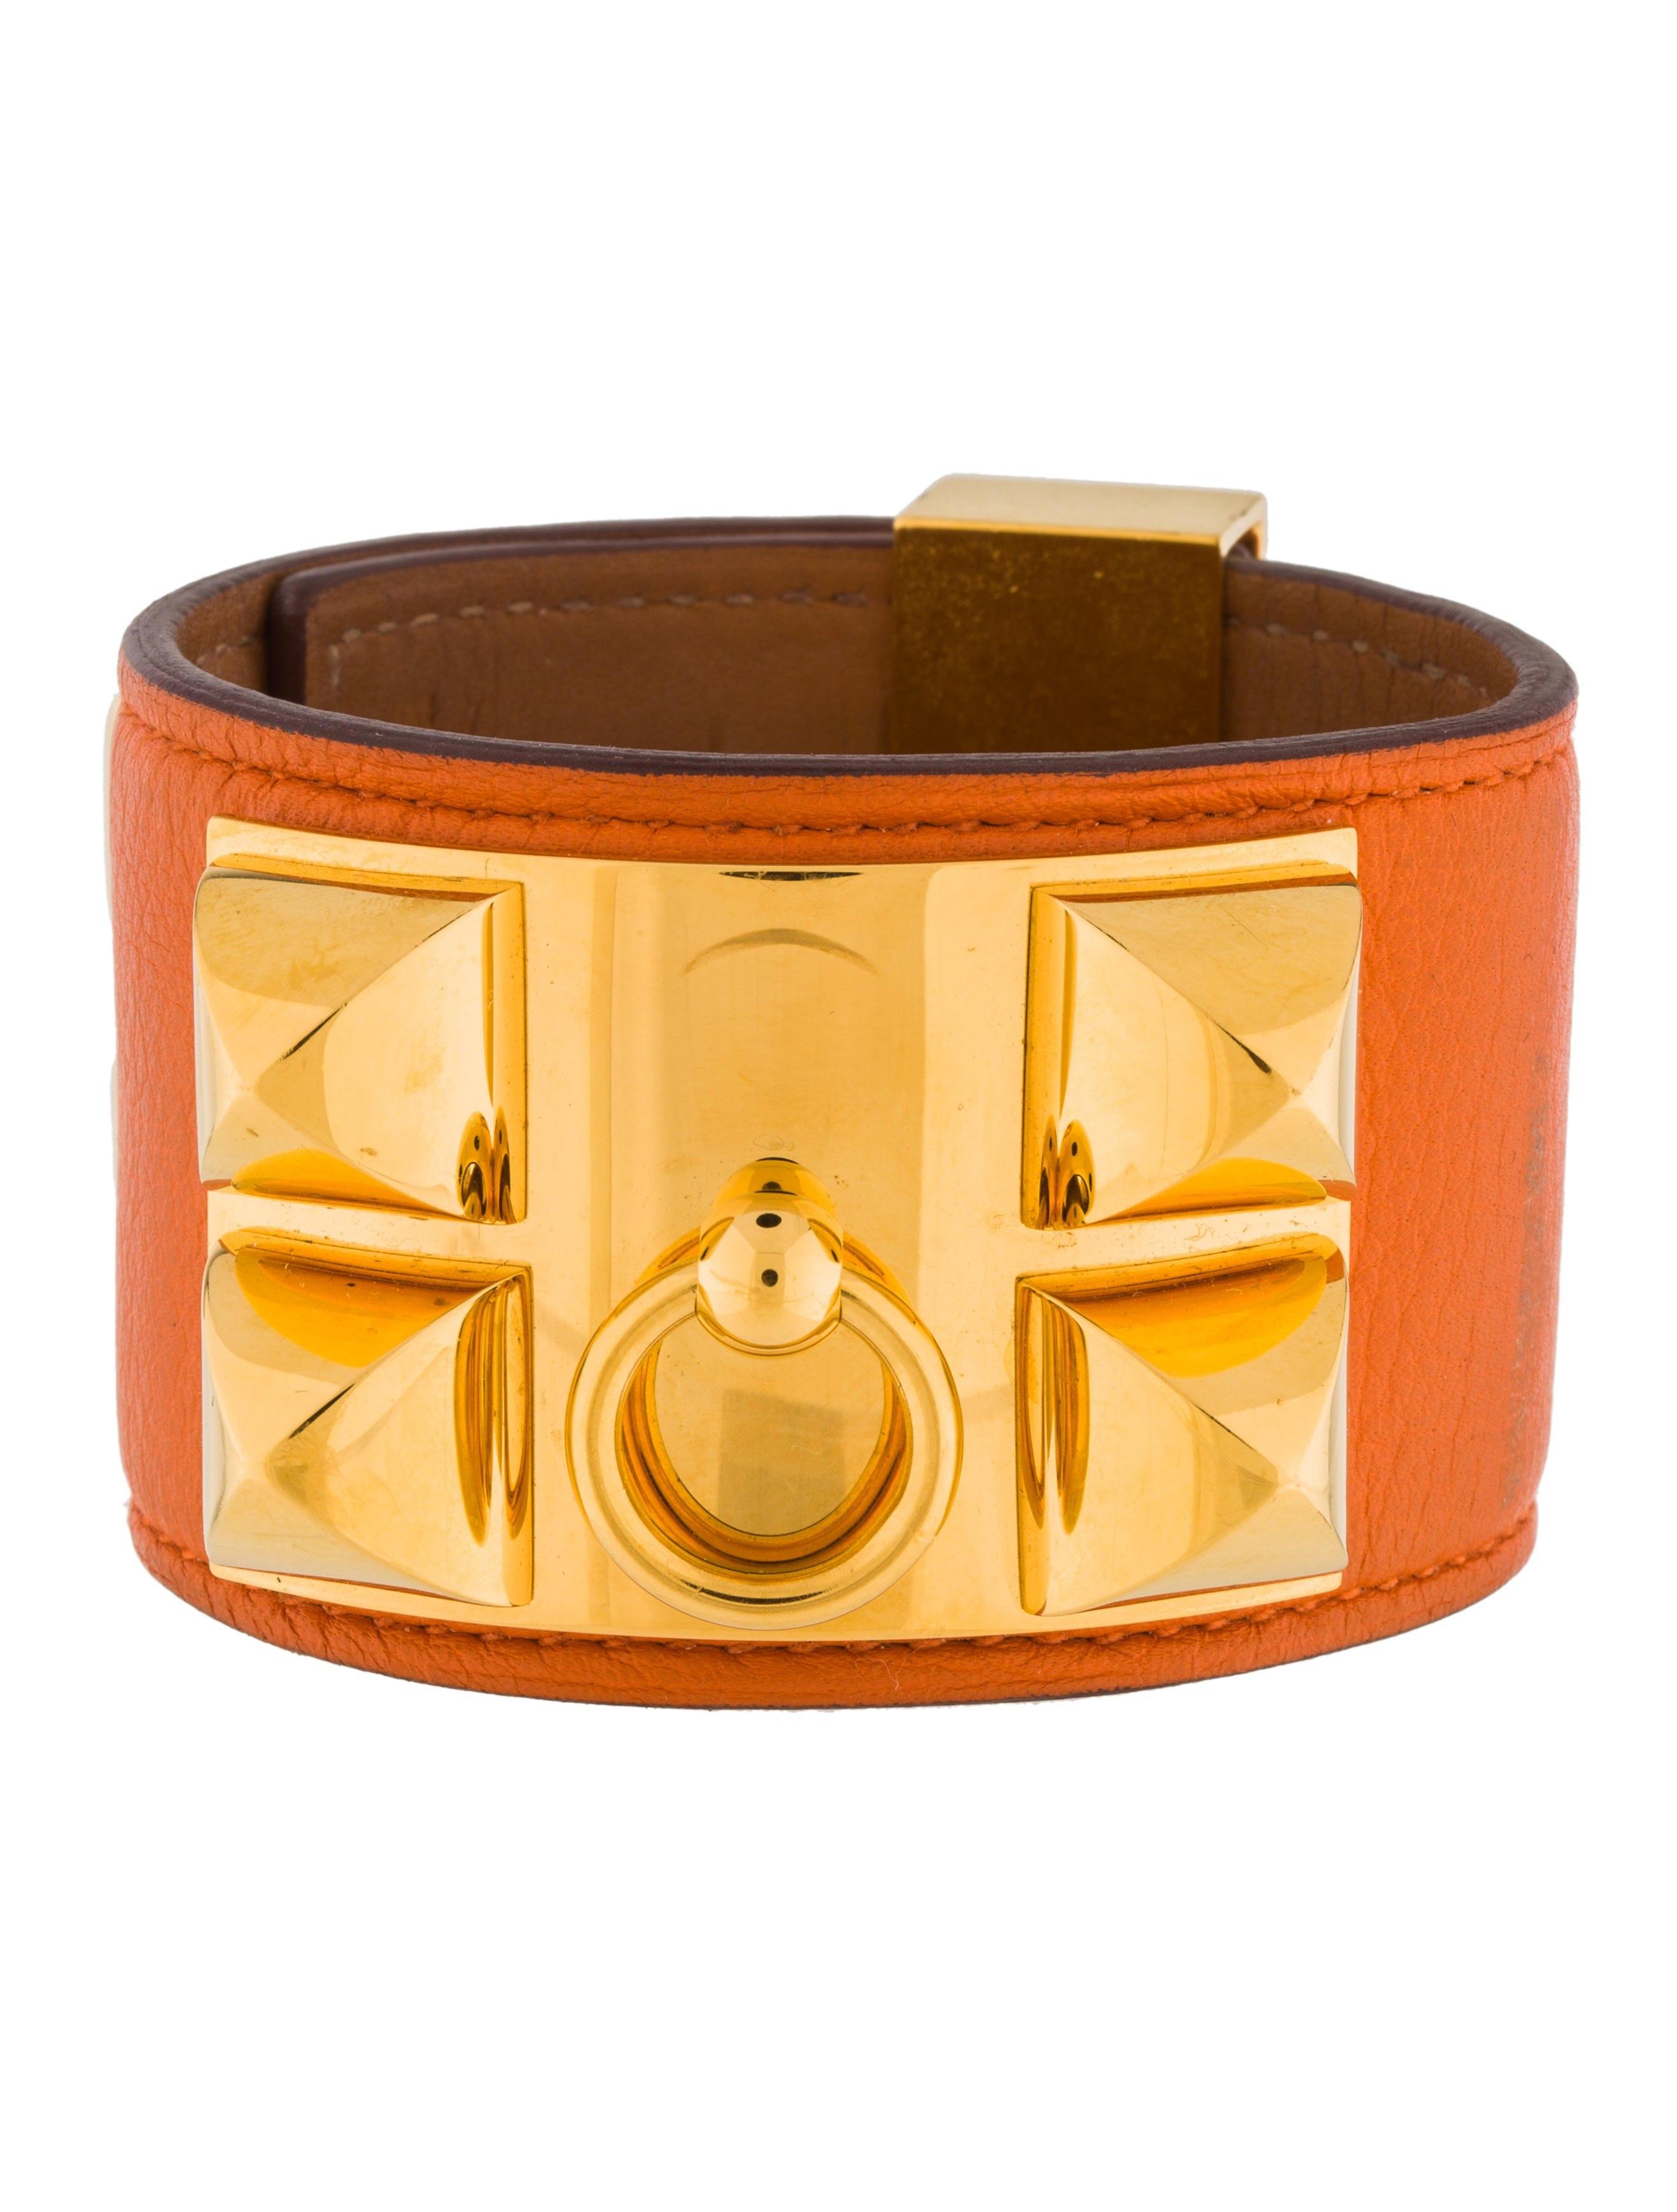 Hermes Cuff Collier De Chien